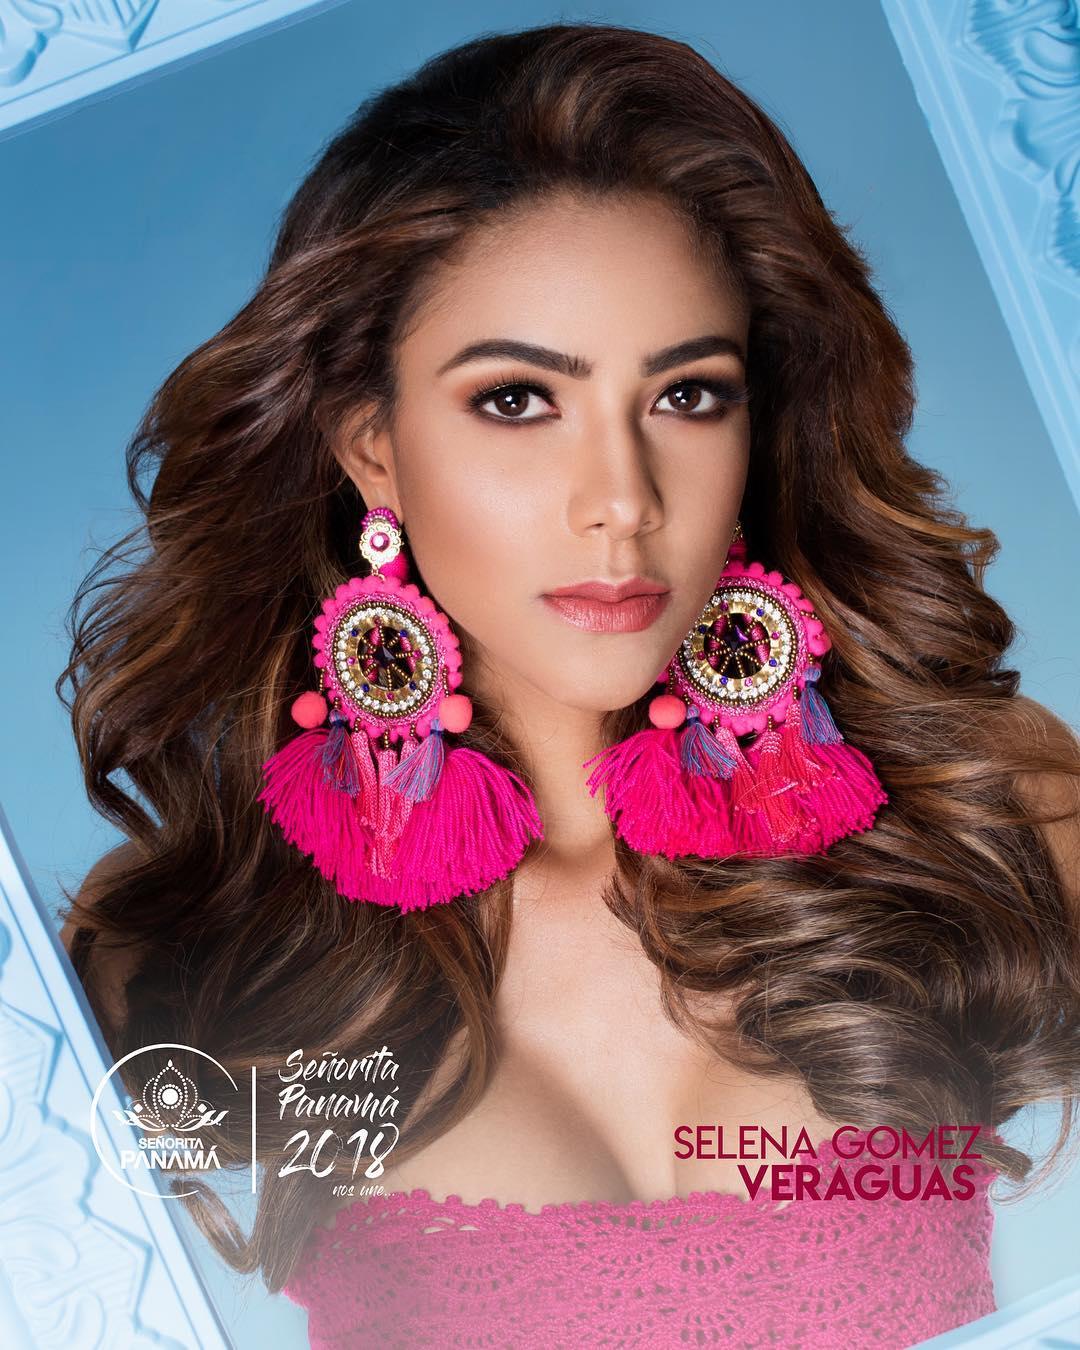 señorita miss colombia 2018 candidates candidatas contestants delegates Miss Veraguas Selena Gómez